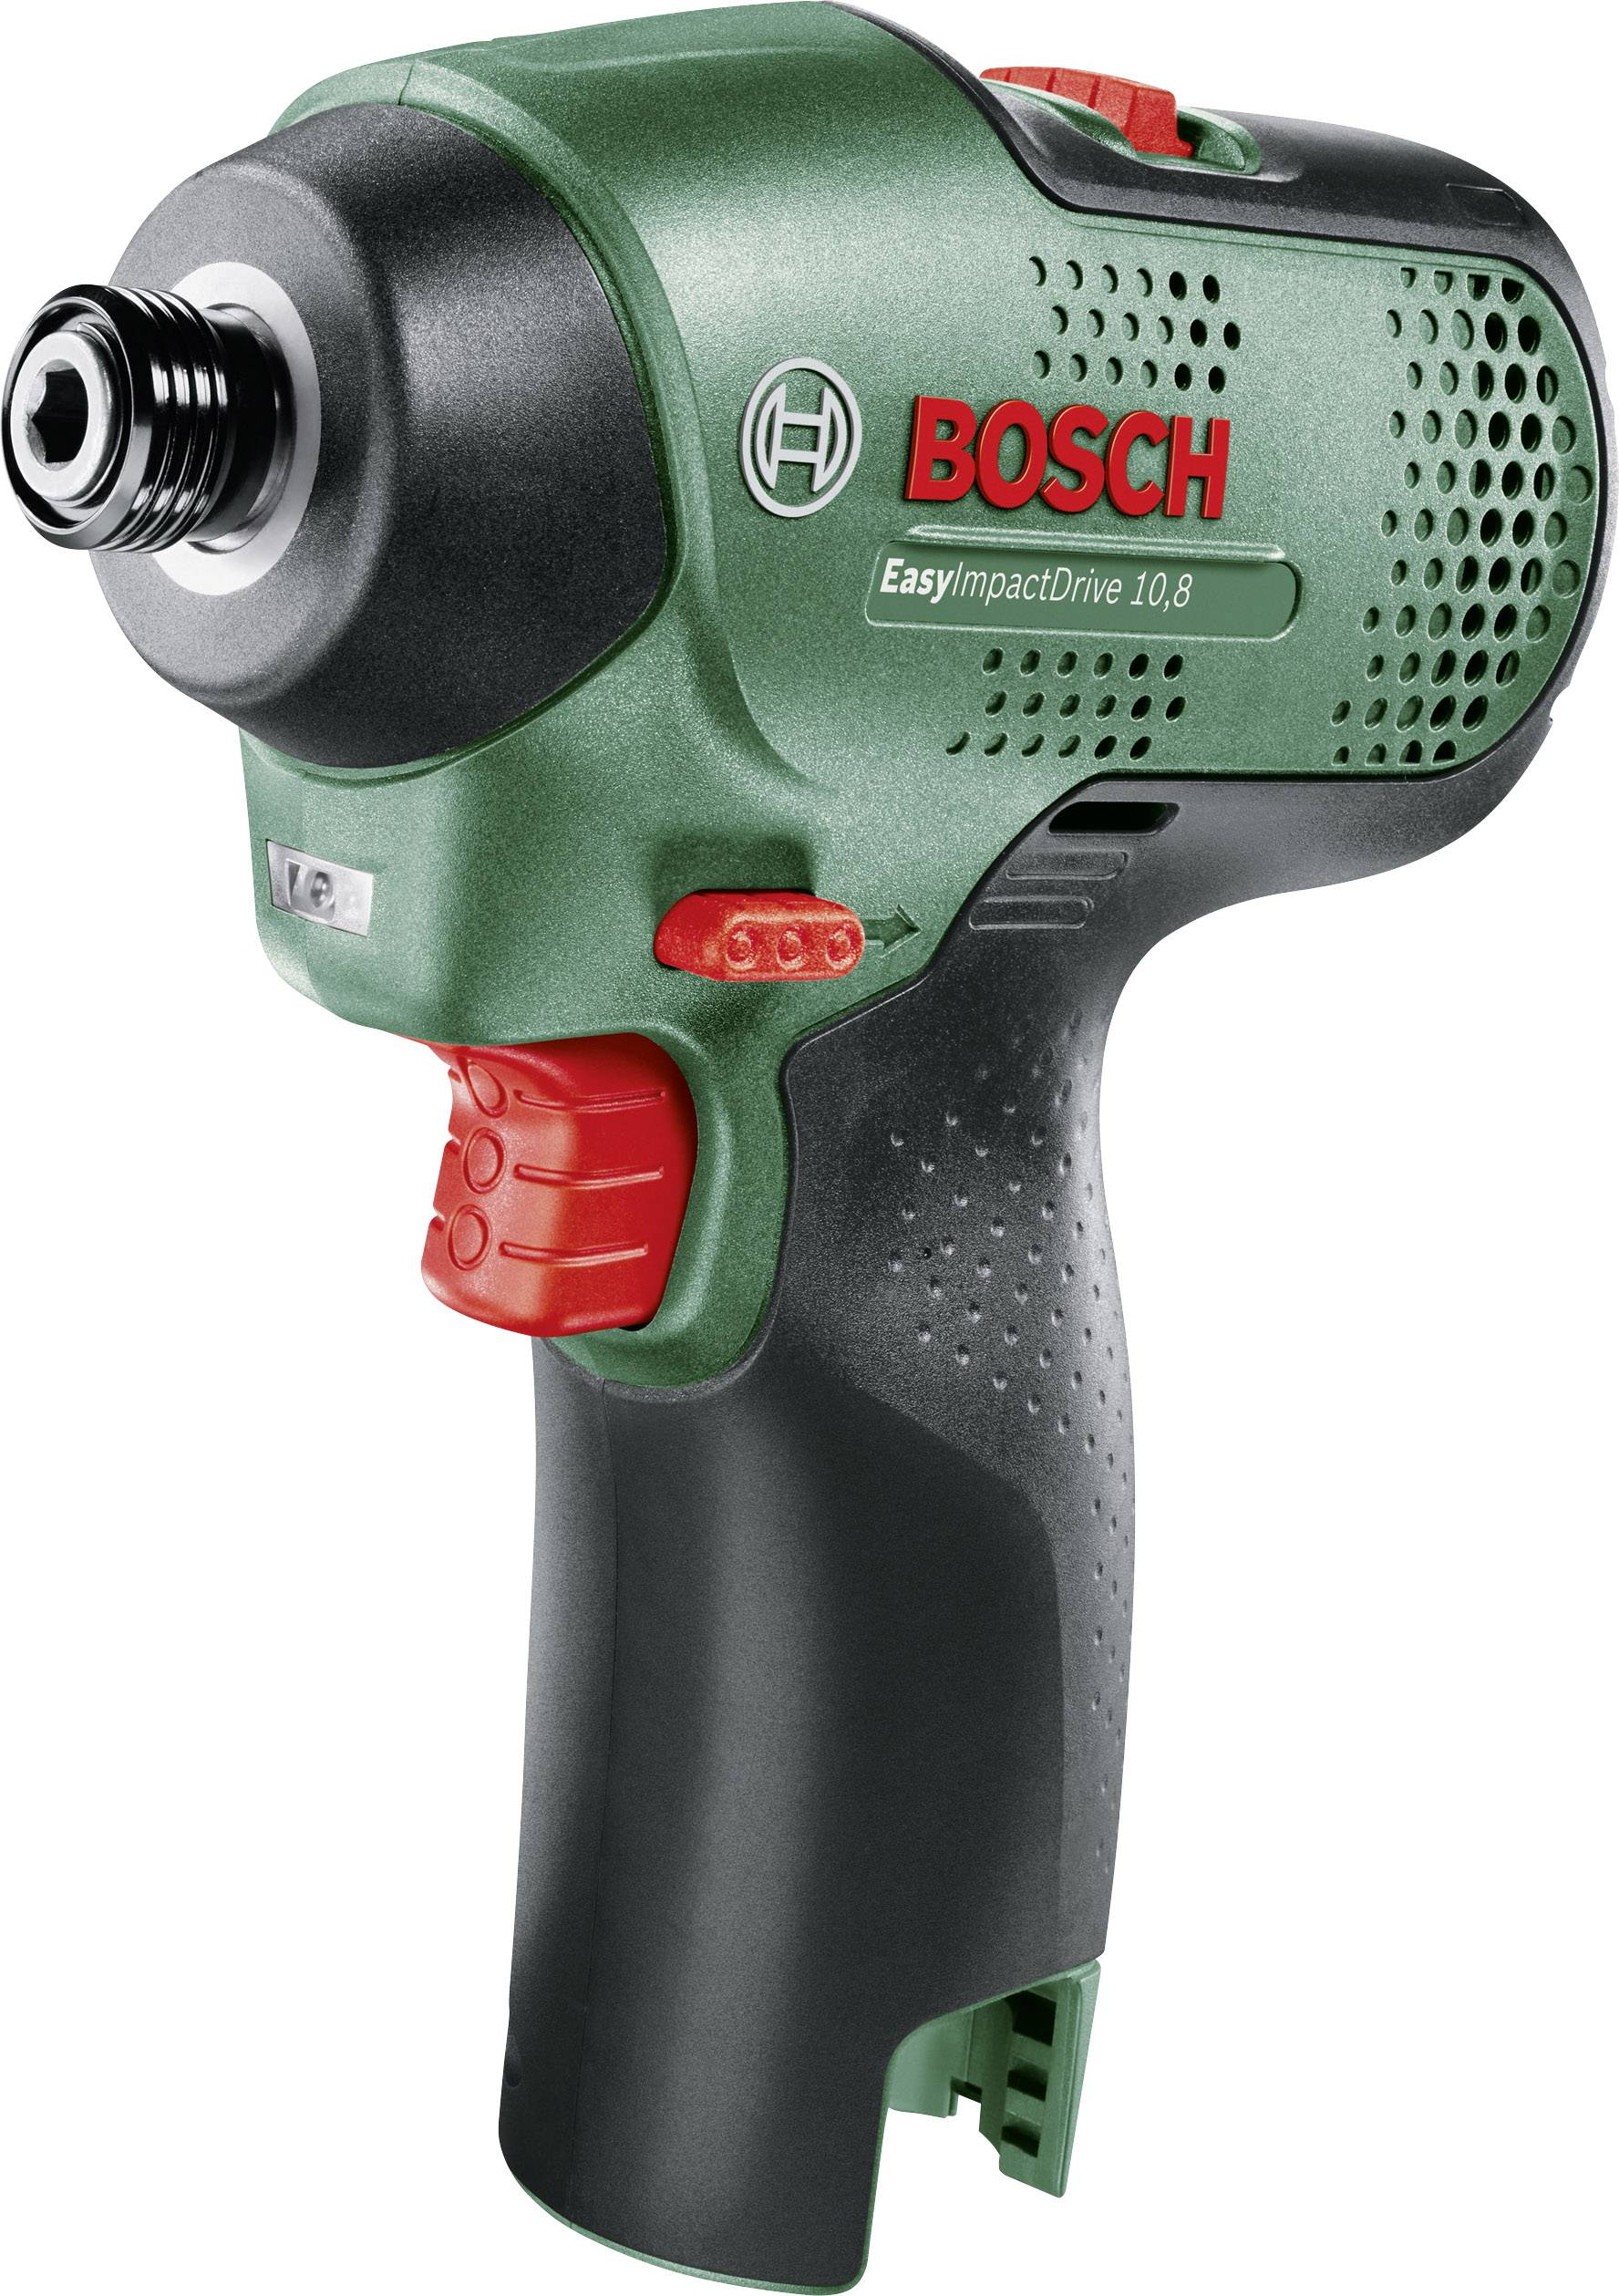 Kända Mutterdragare batteri Bosch Home and Garden EasyImpactDrive 12 12 GQ-09